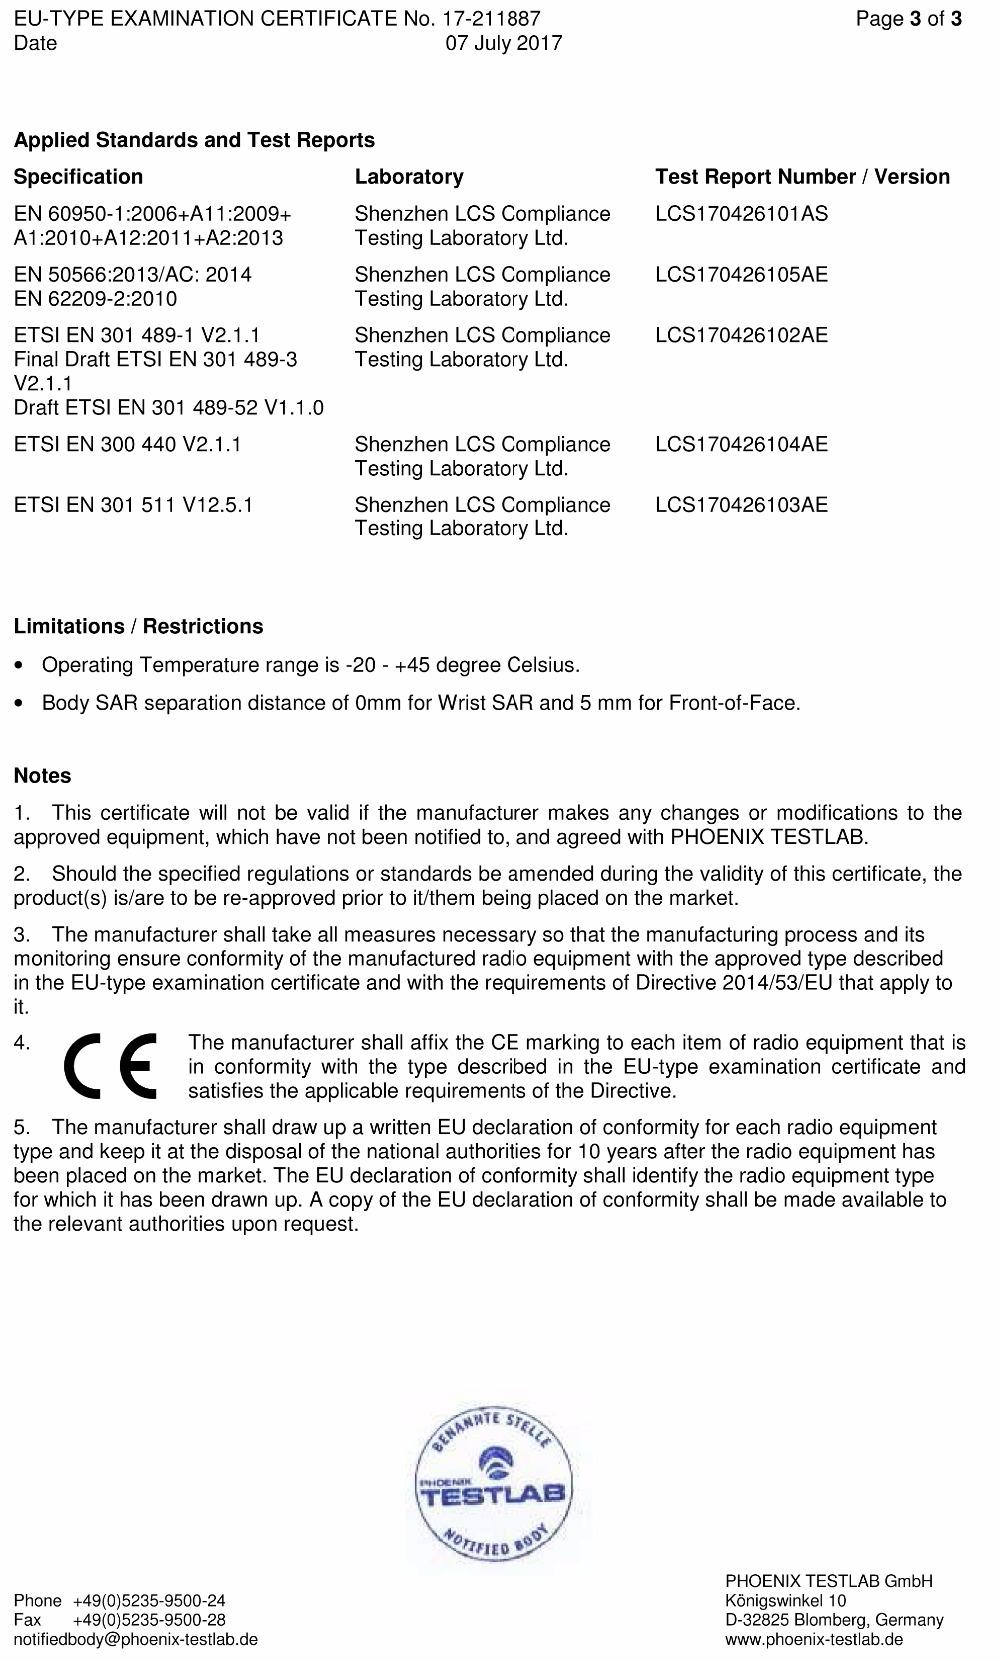 17-211887_RED Certificate_M05-3